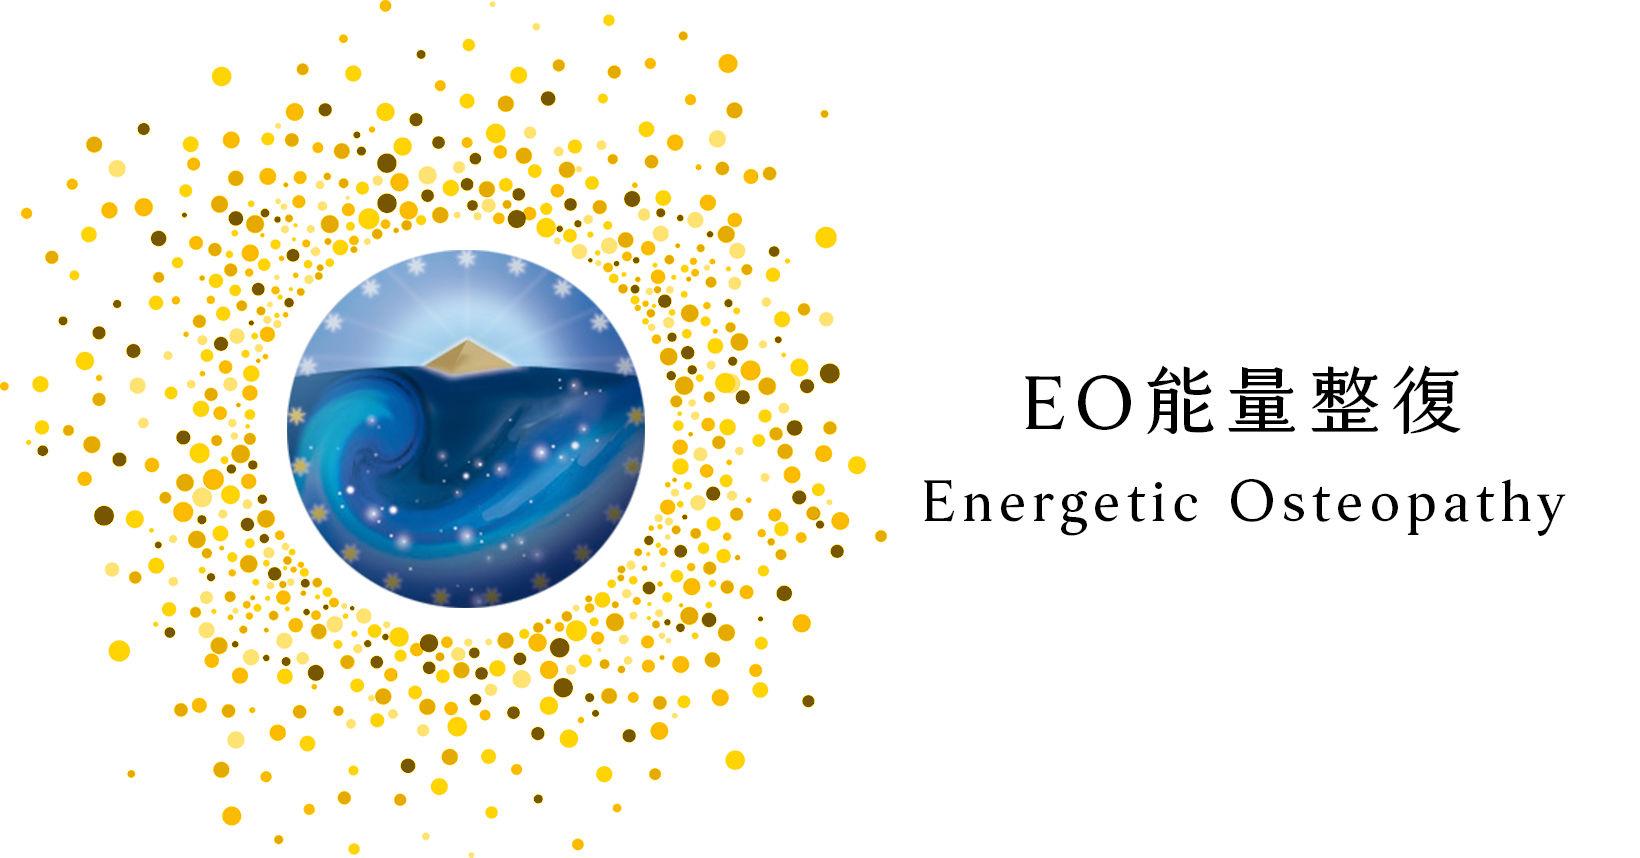 EO能量整復 Energetic Osteopathy